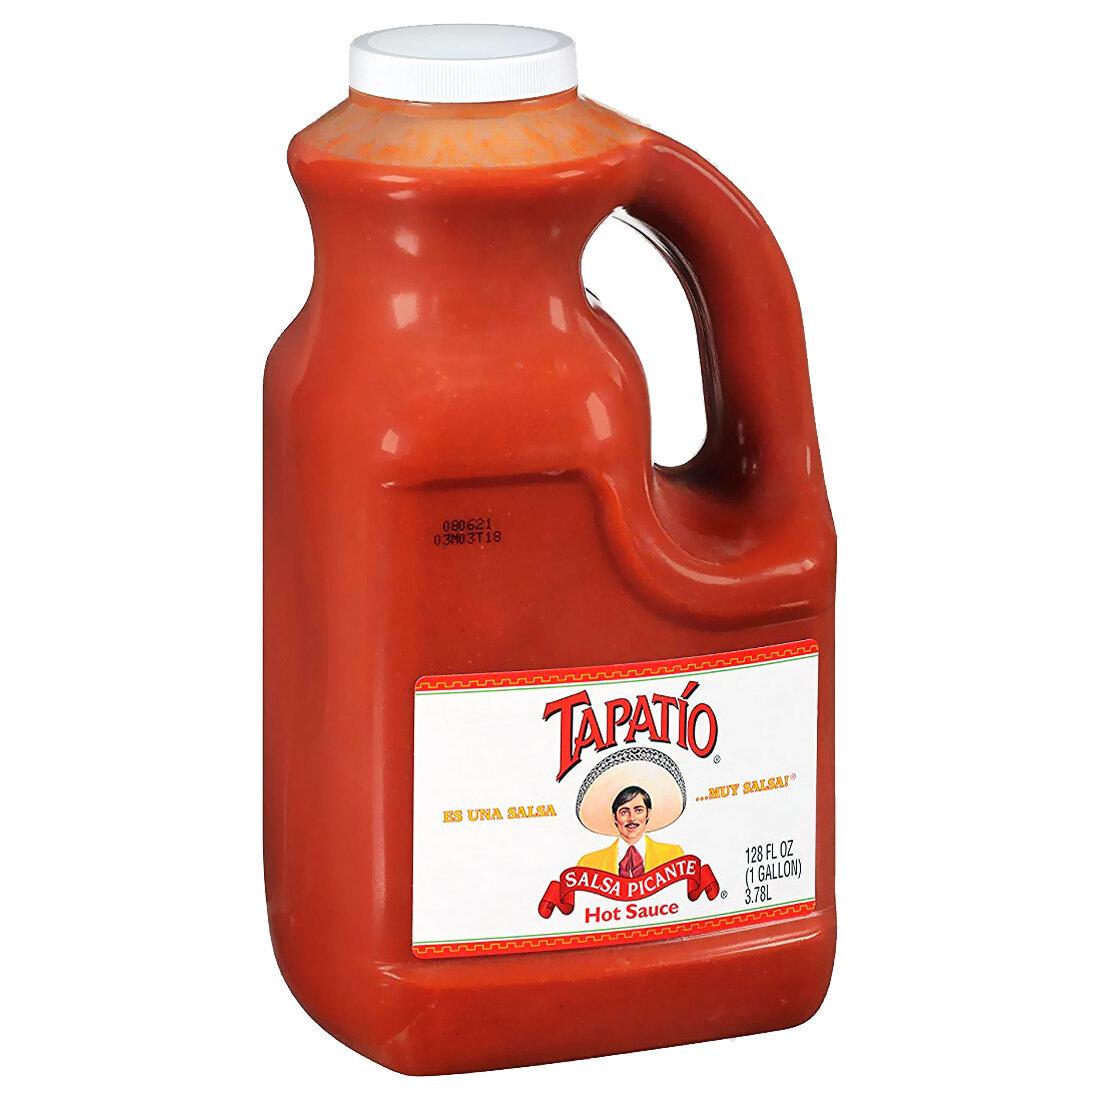 Tapatío Tulinen Kastike | Tapatío Hot Sauce | TAPATÍO | 3785 ML